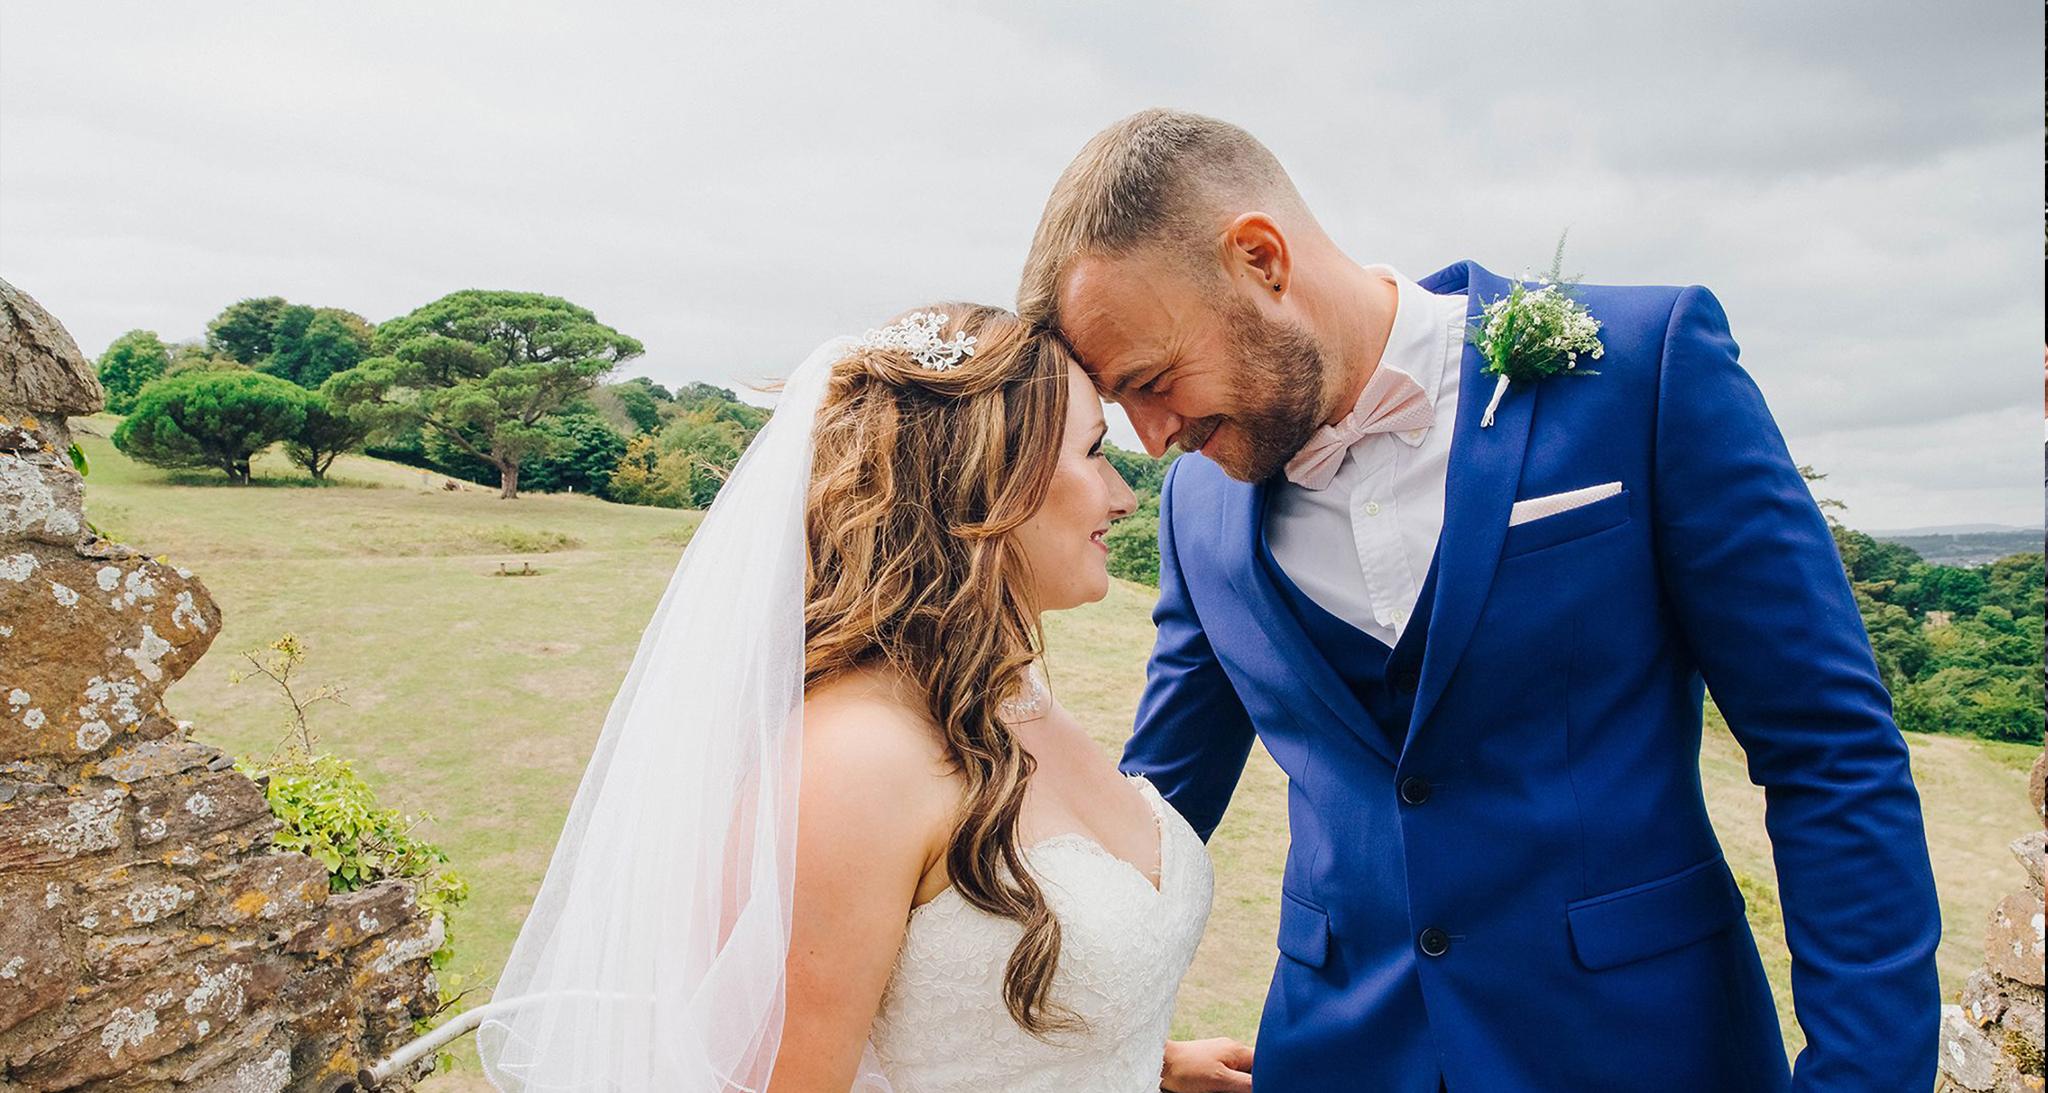 cornwall wedding videography 3